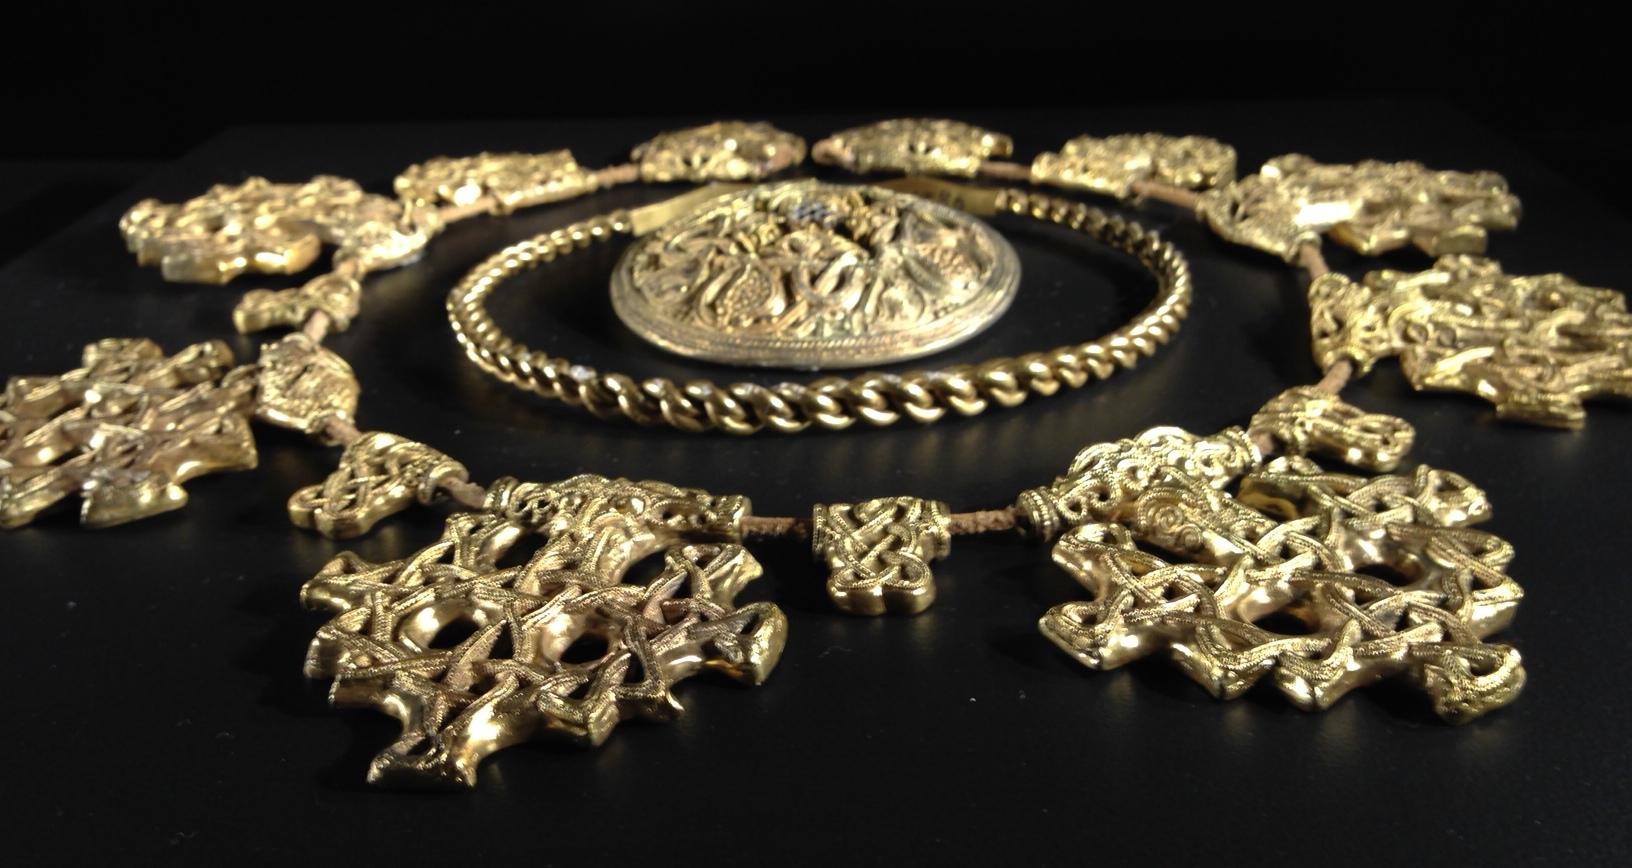 viking exhibition 2 bronze necklace torc